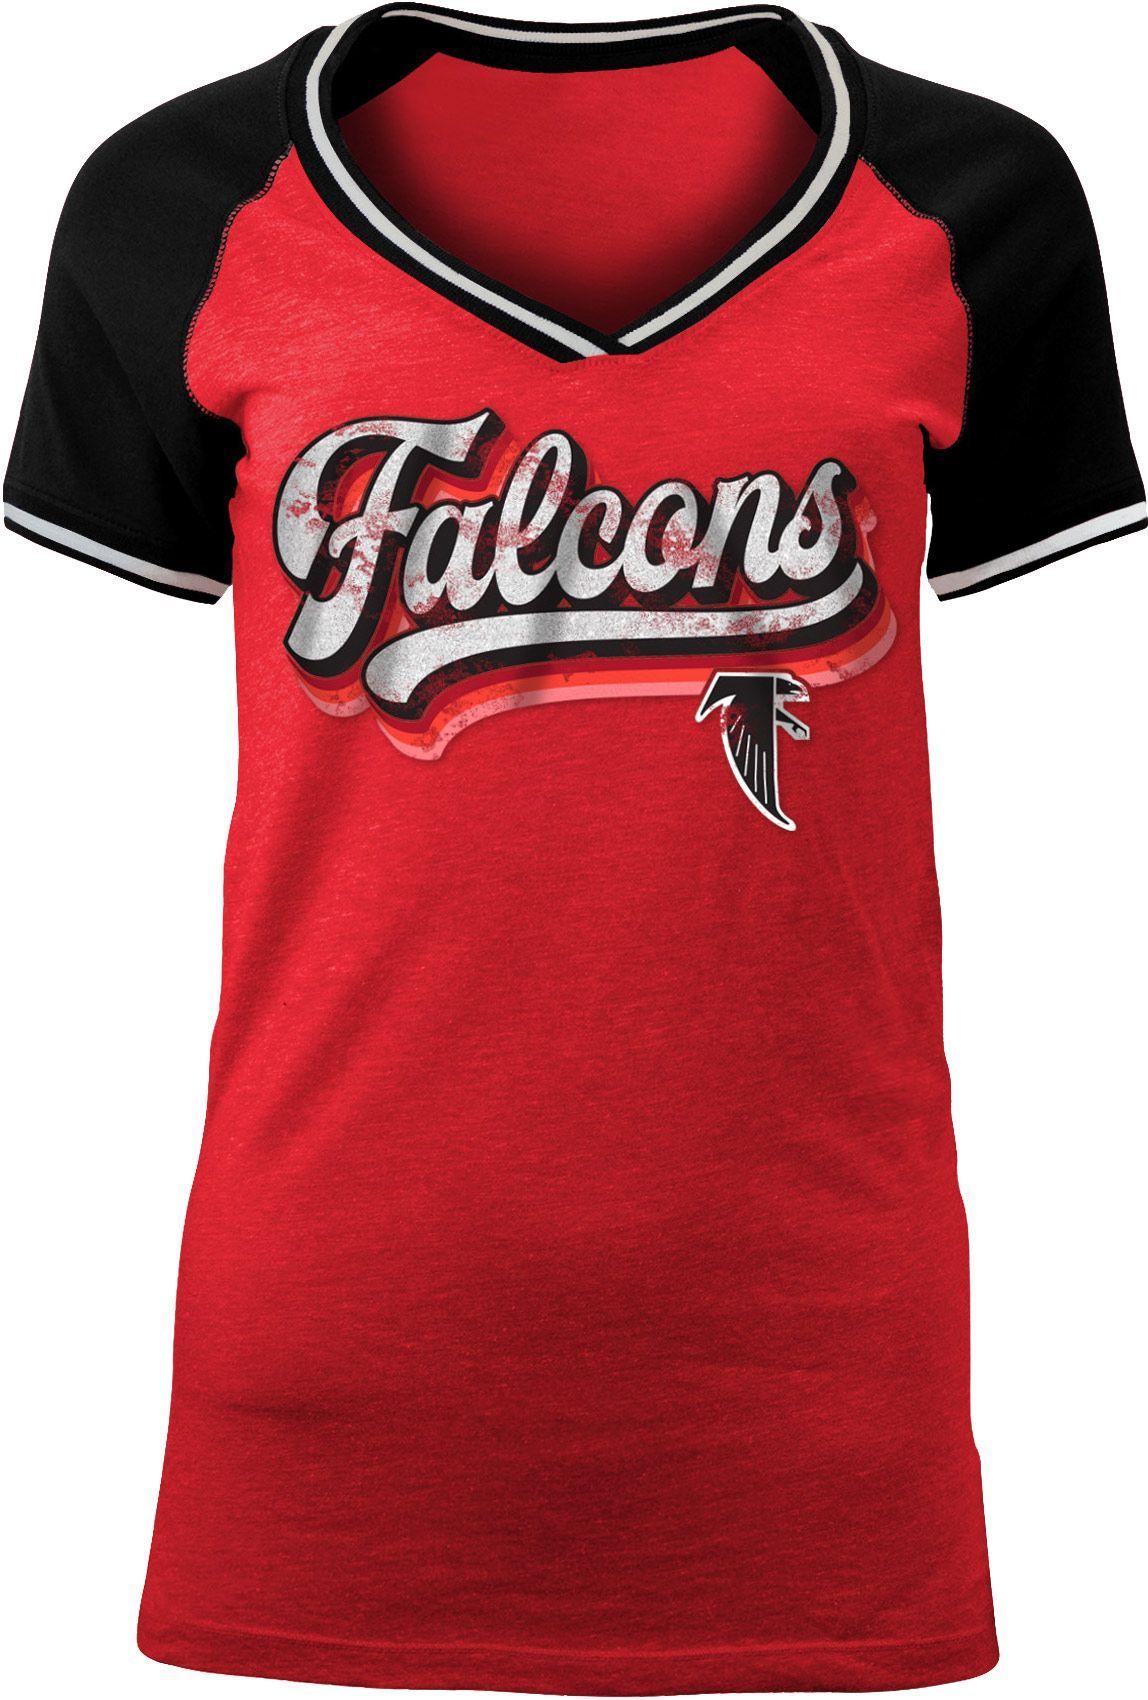 best service d32f9 39386 NFL Team Apparel Women's Atlanta Falcons Retro Glitter T ...